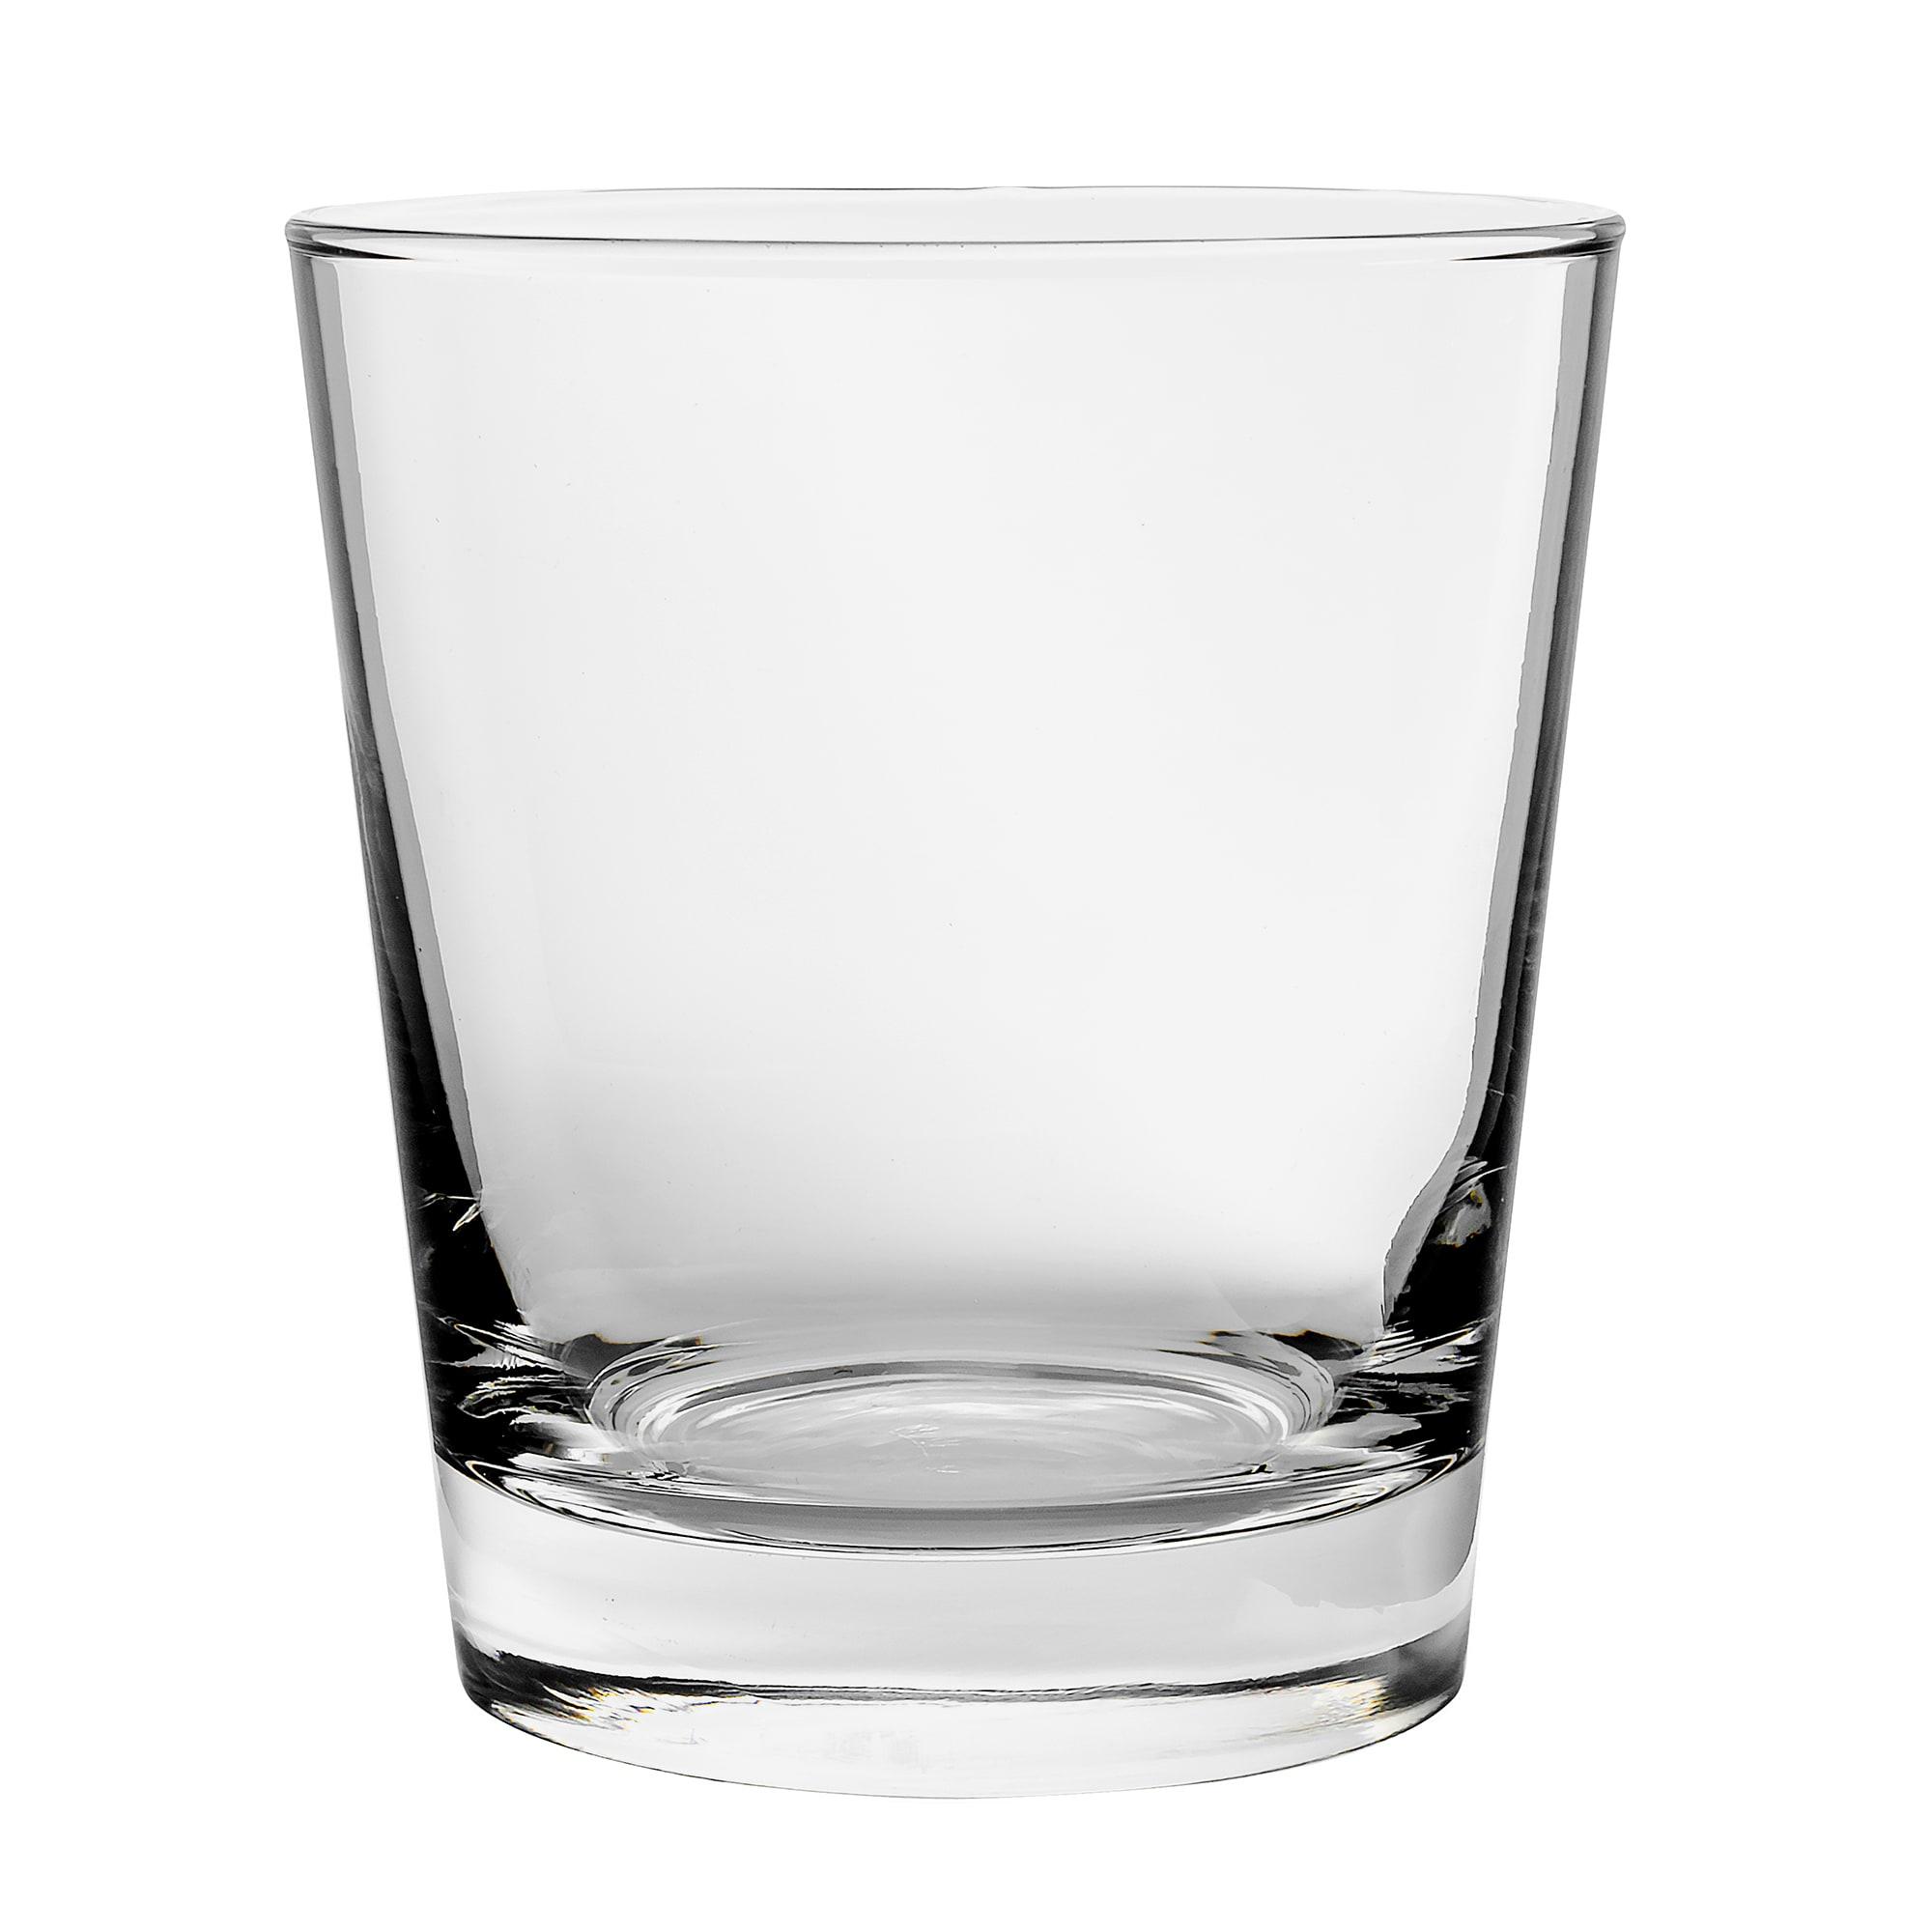 Libbey 139 13-oz Heavy Base Hi-Ball Glass - Safedge Rim Guarantee